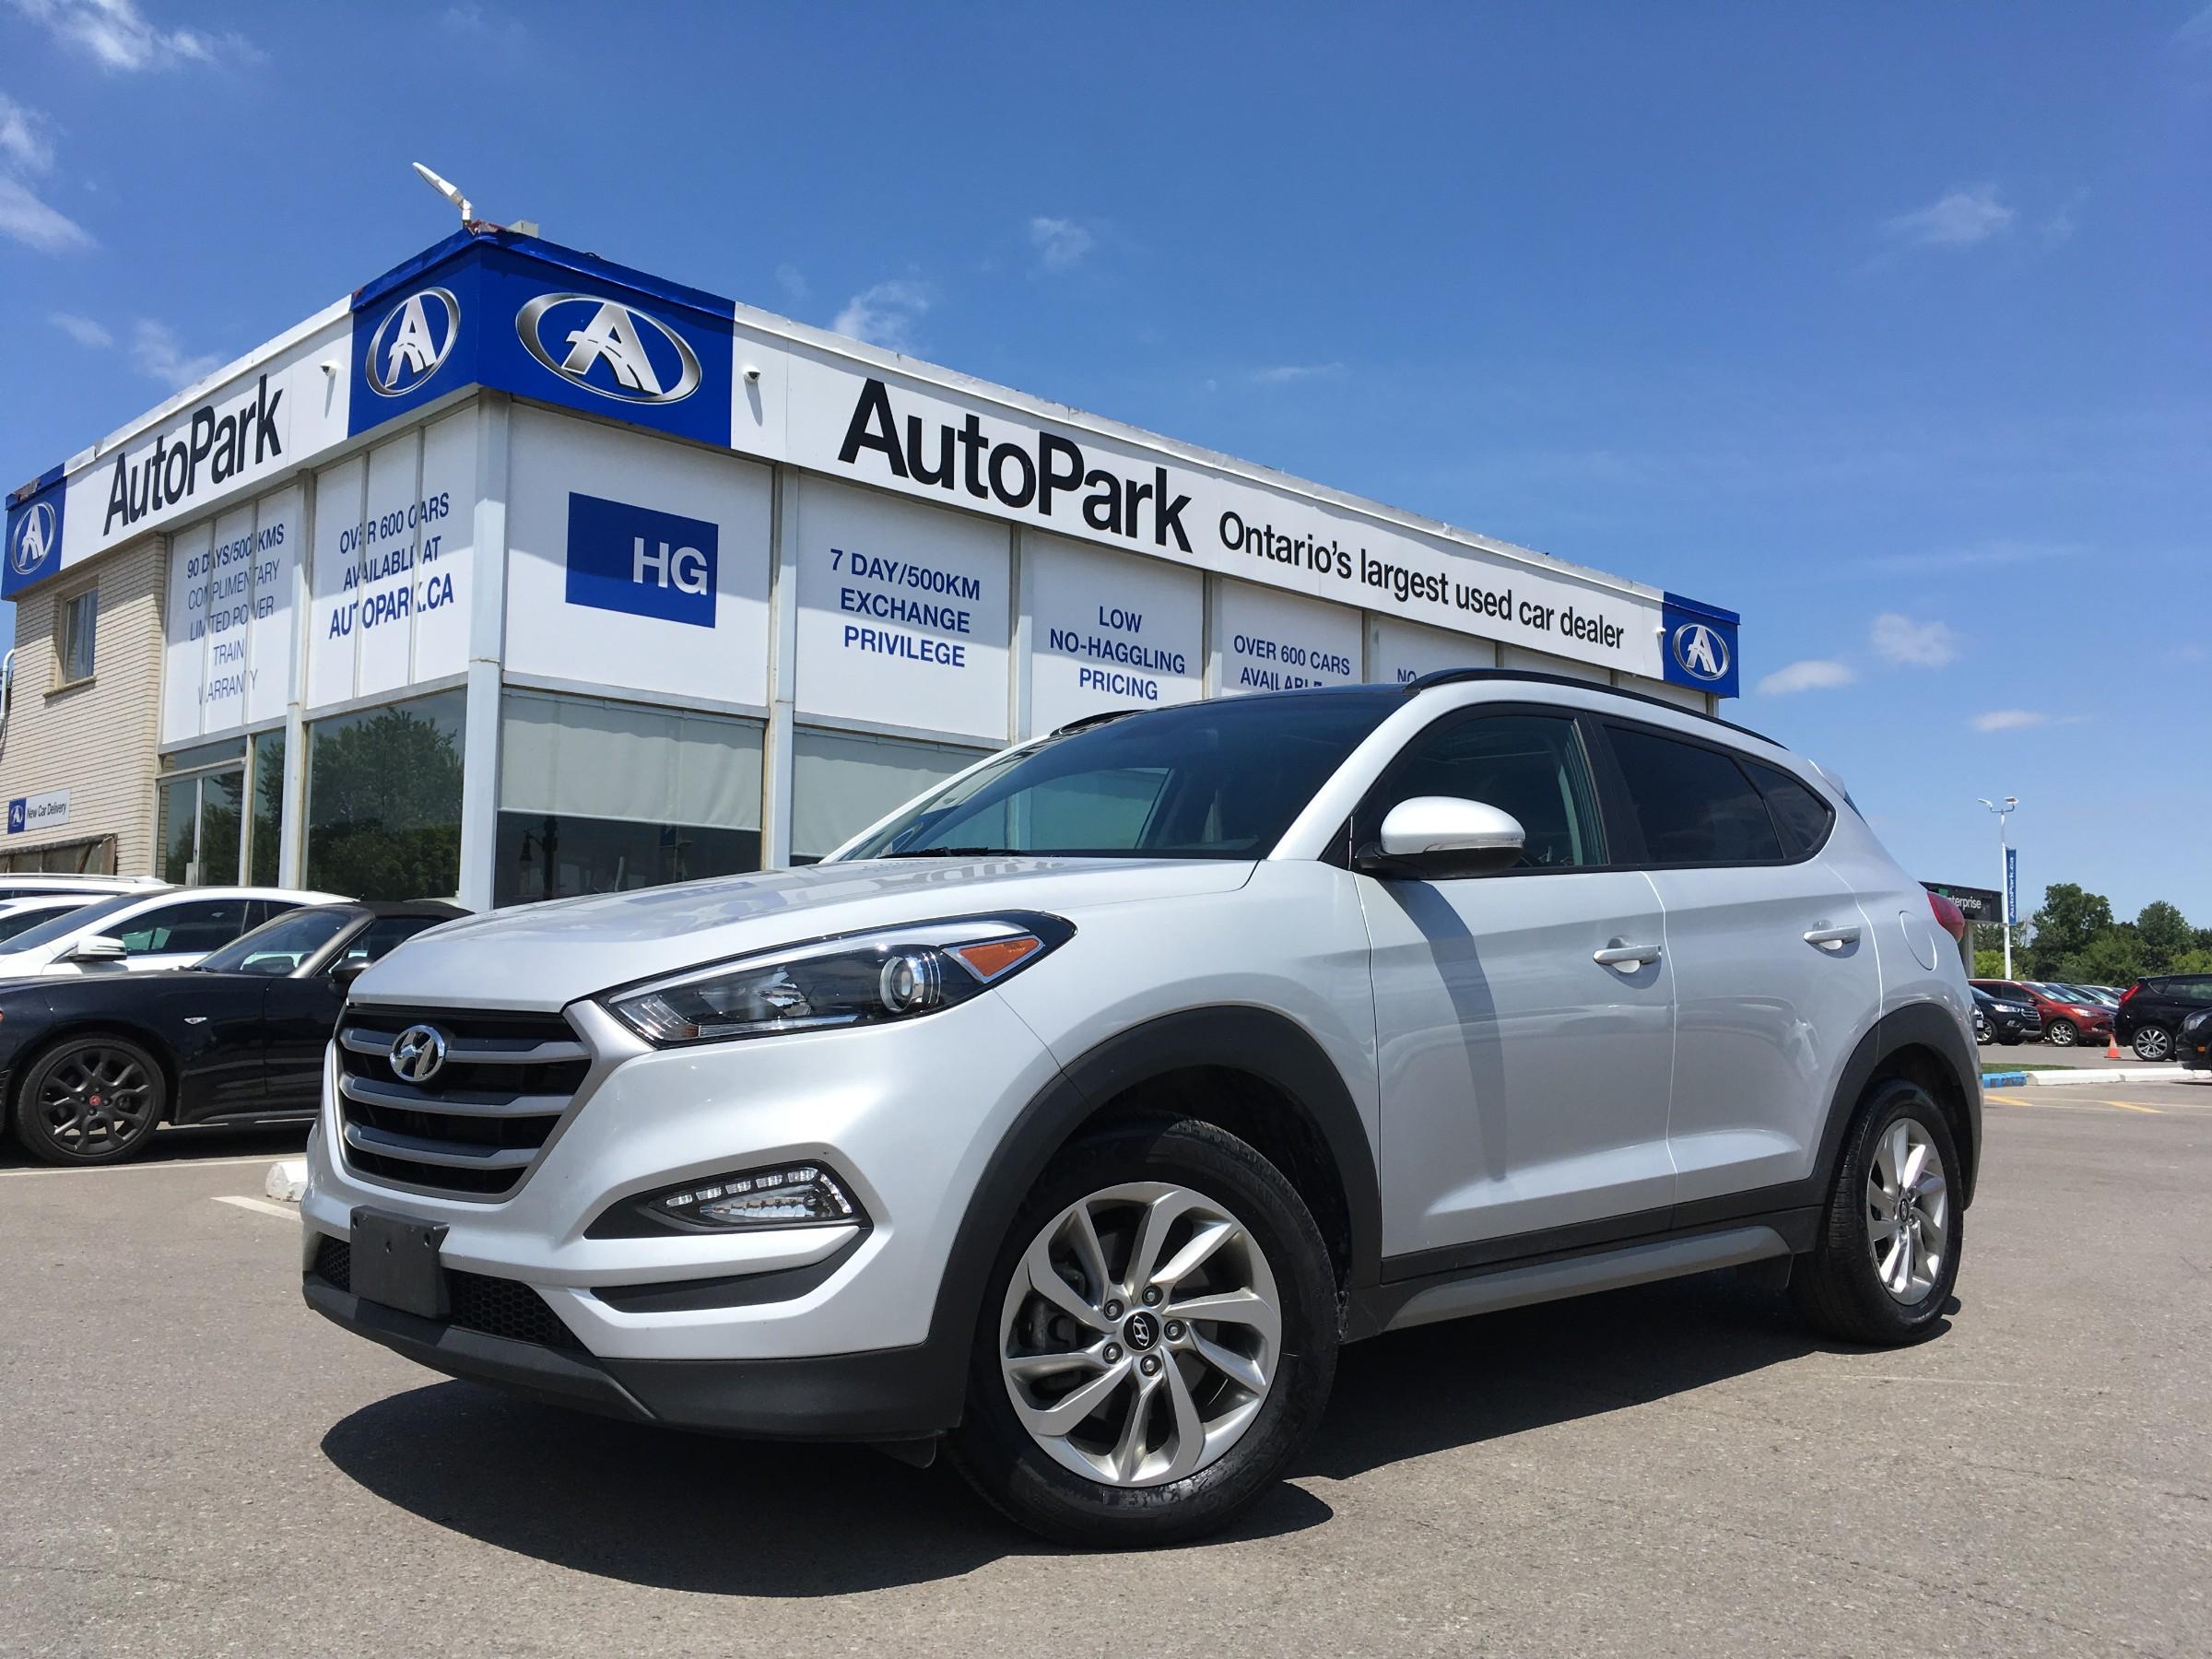 Used Hyundai Tucson For Sale Kitchener, ON - CarGurus